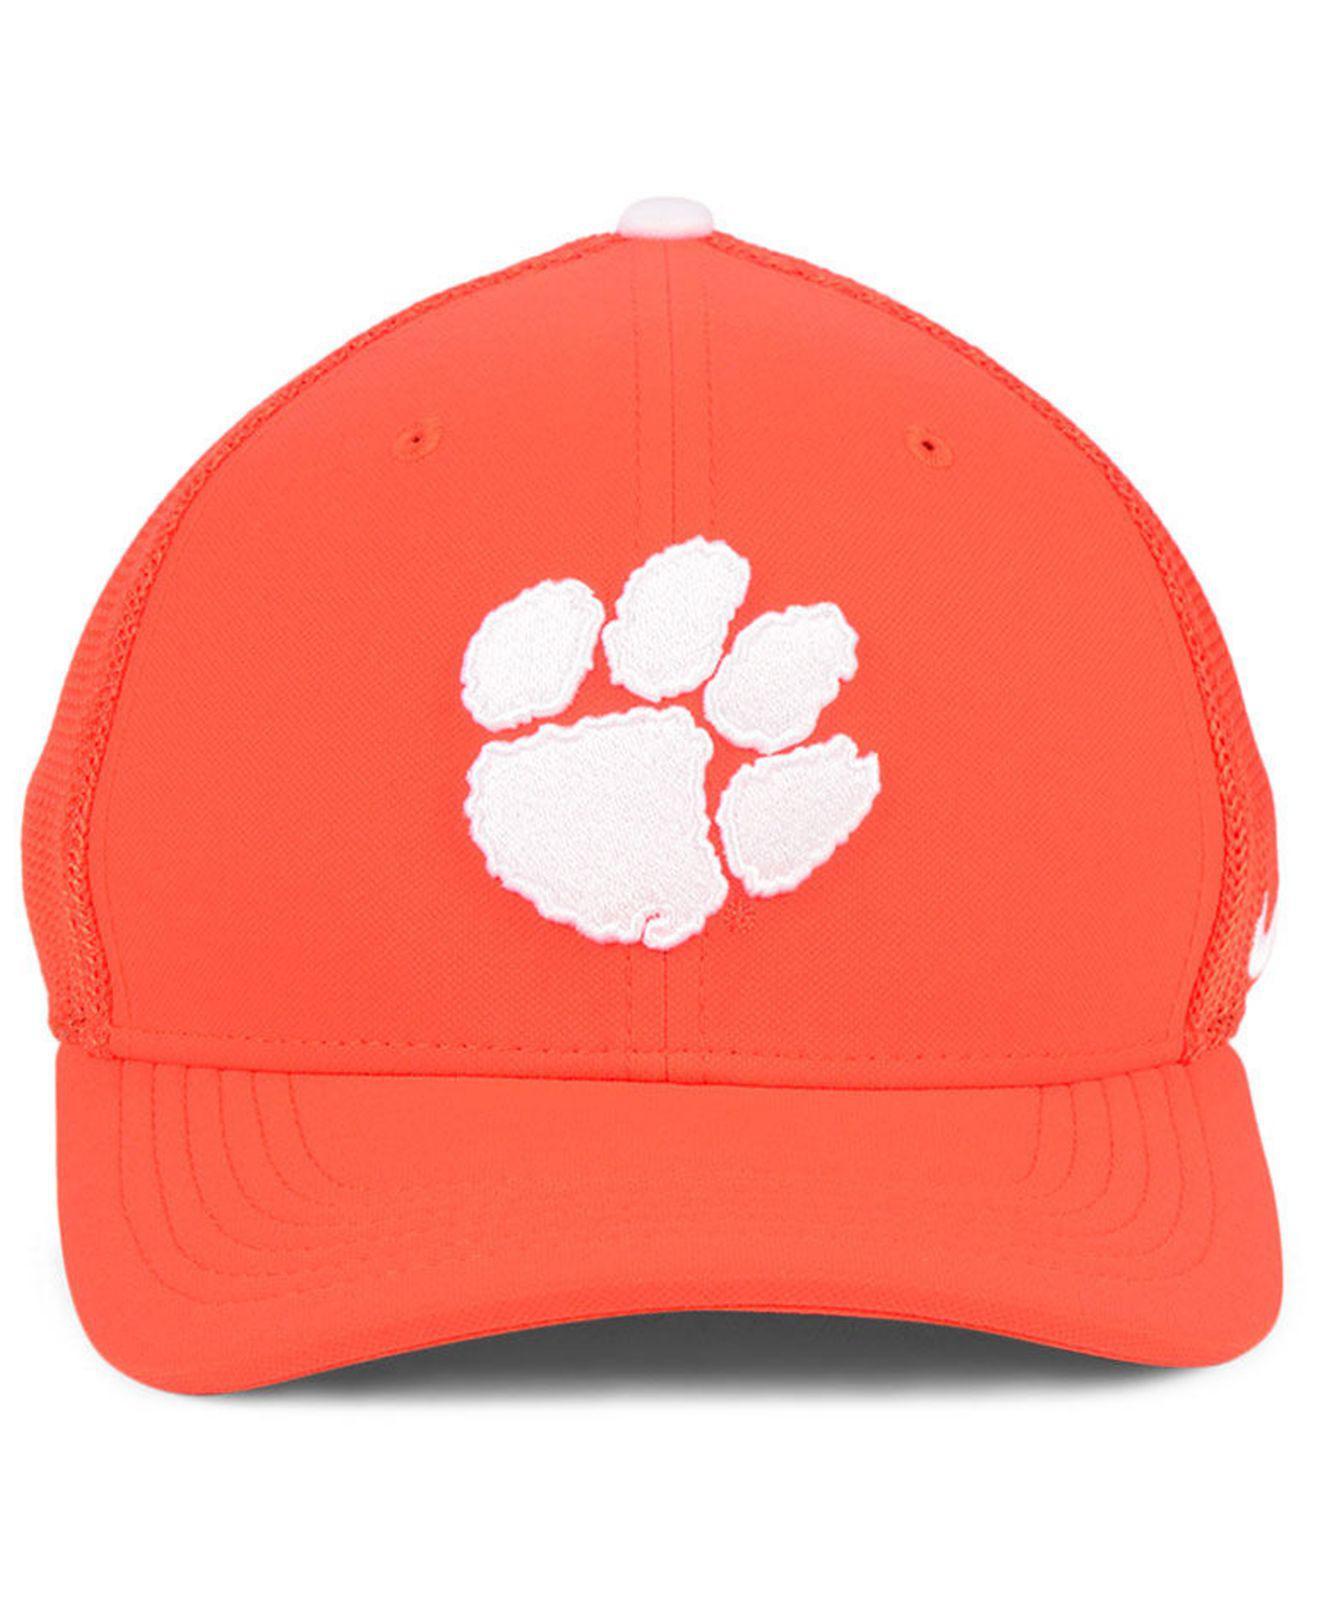 innovative design 53768 892b9 Lyst - Nike Clemson Tigers Col Aro Swooshflex Cap in Orange for Men